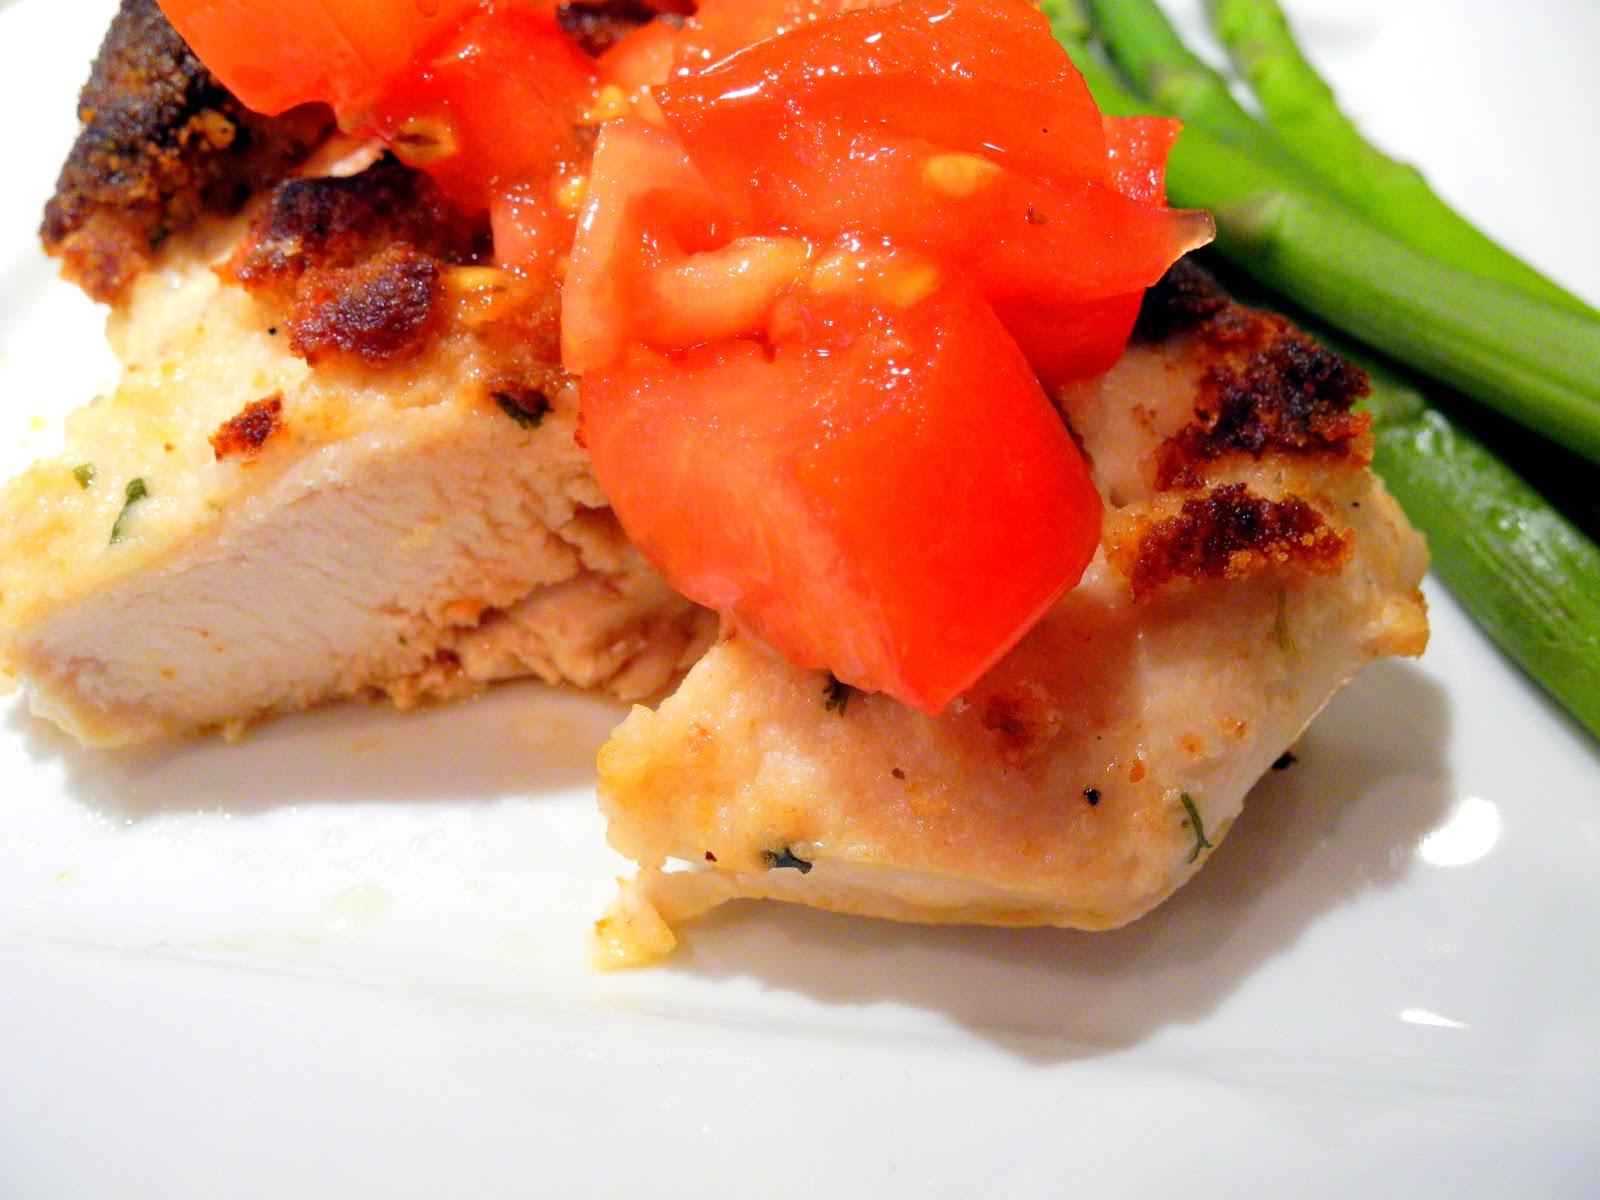 ... bruschetta parmesan crusted bruschetta parmesan crusted chicken